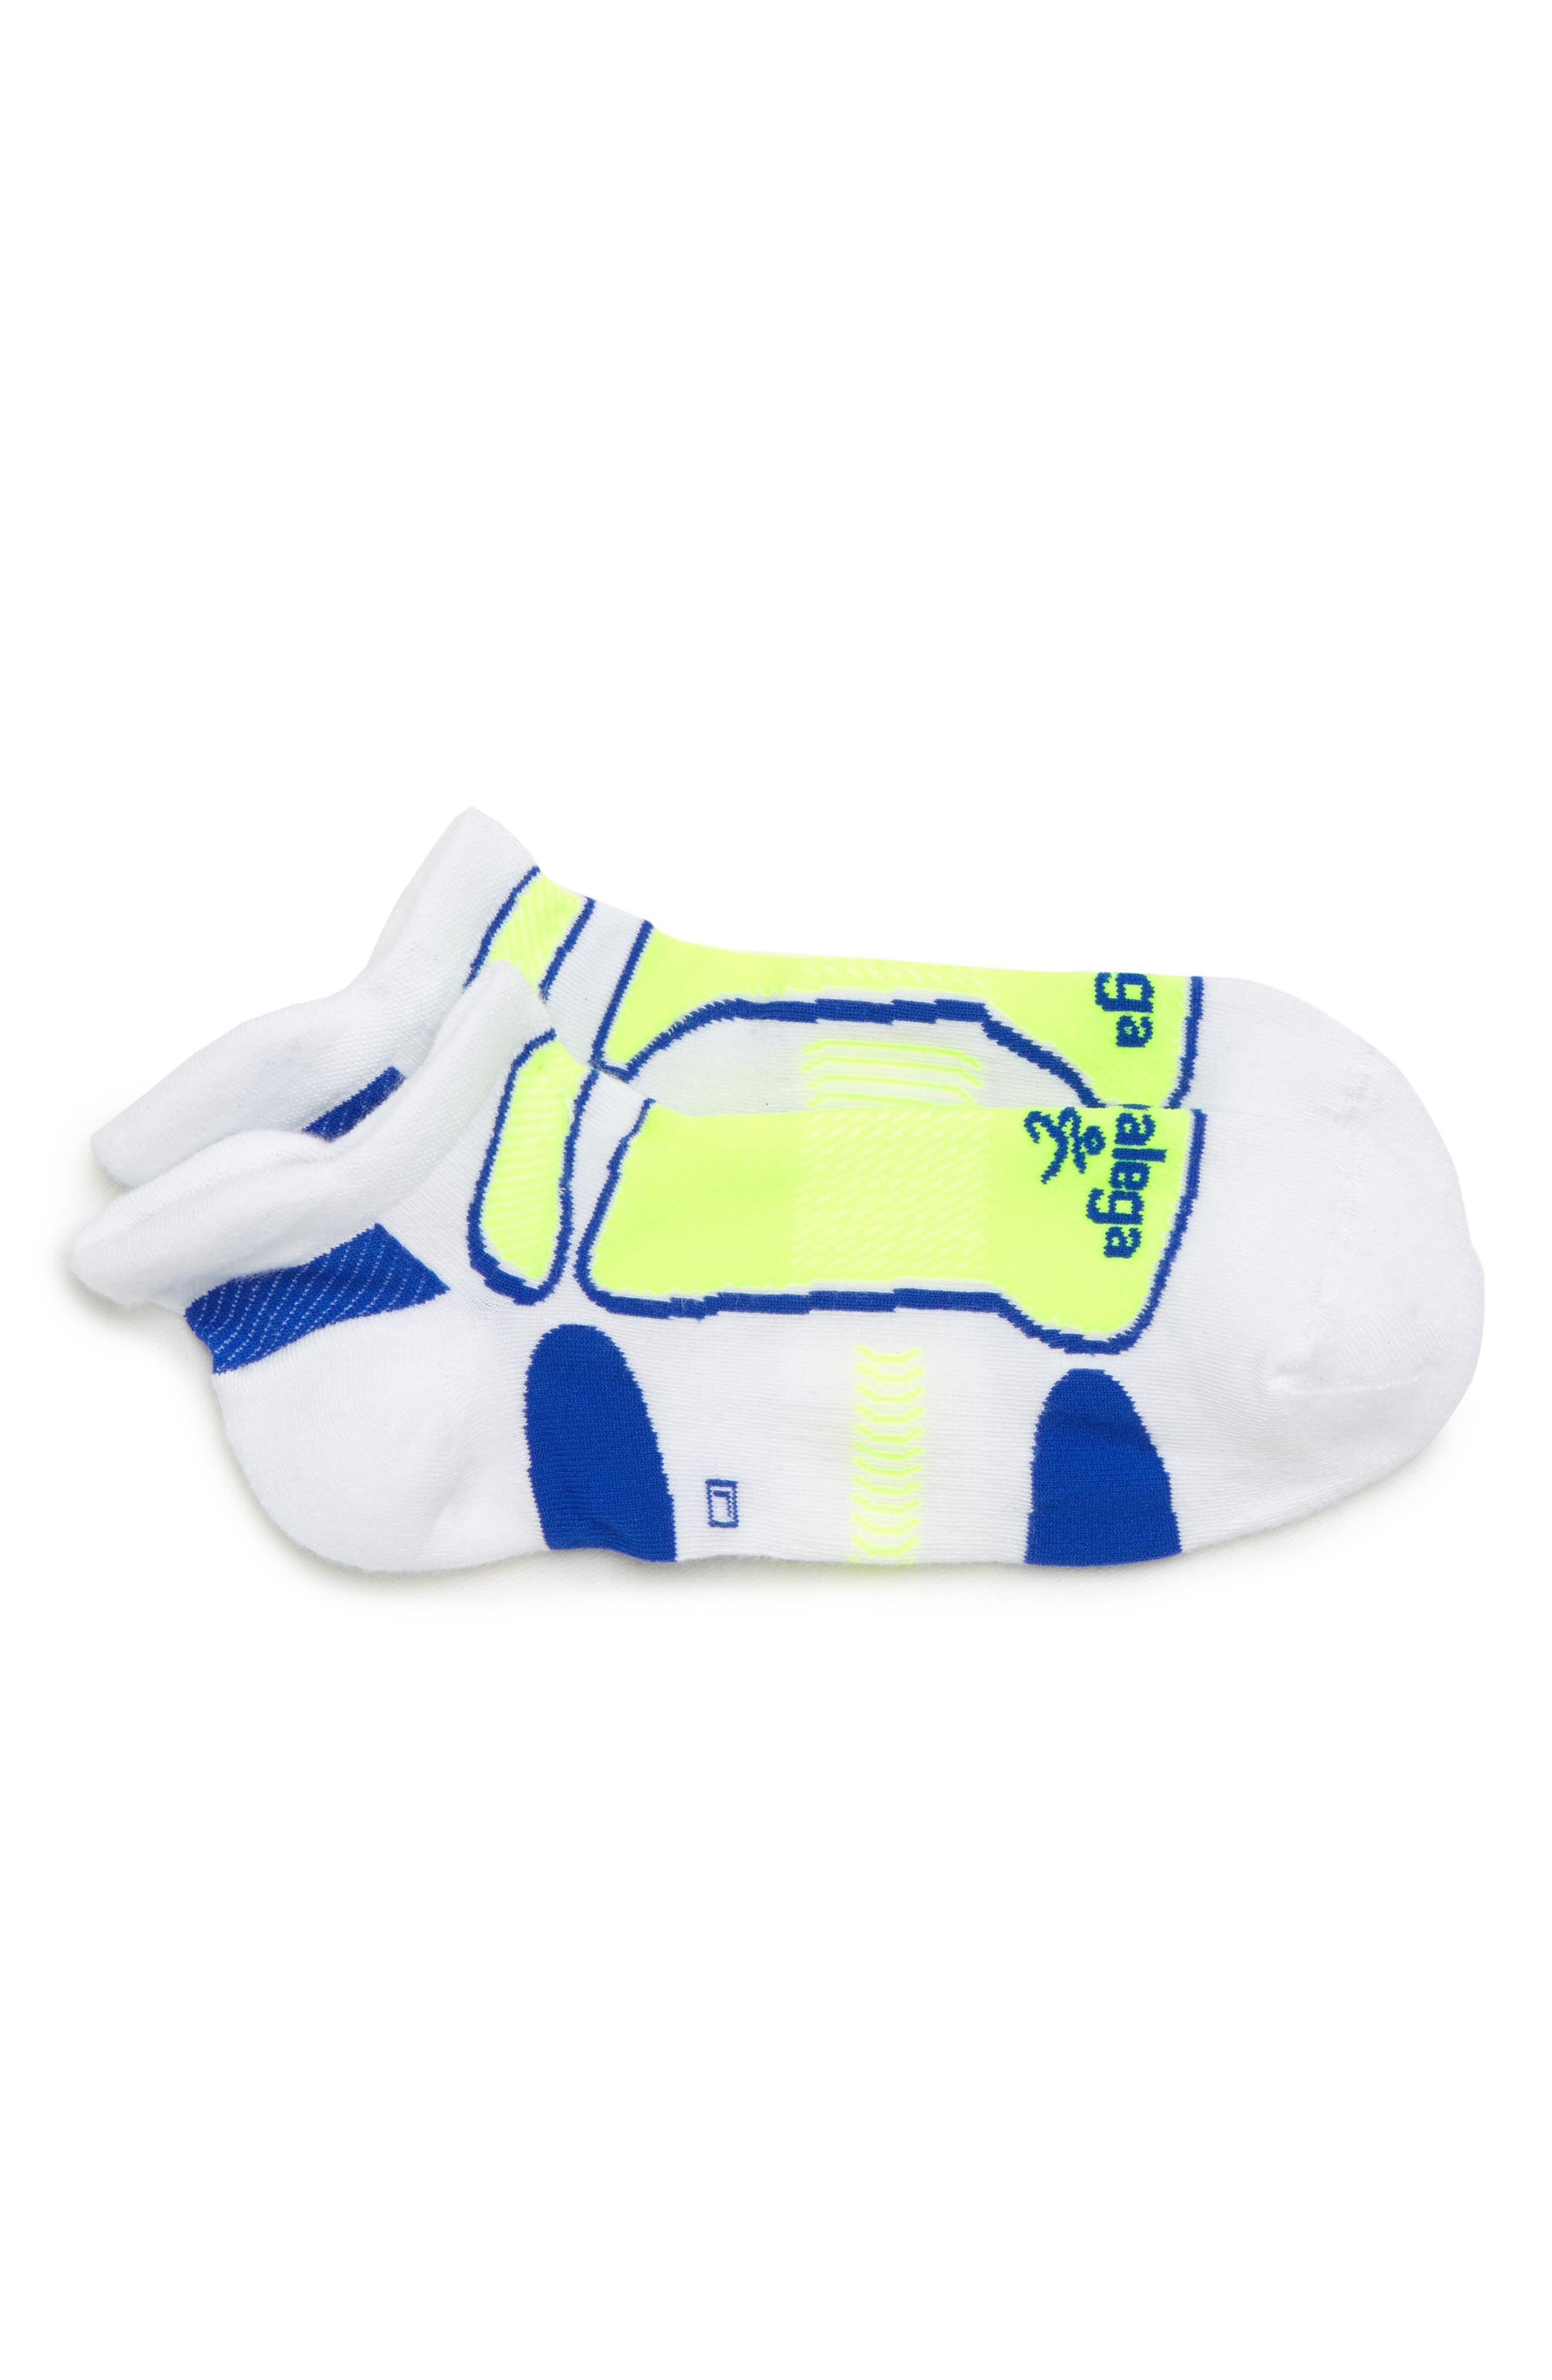 Ultra Light Socks,                             Main thumbnail 1, color,                             White/ Neon Yellow/ Royal